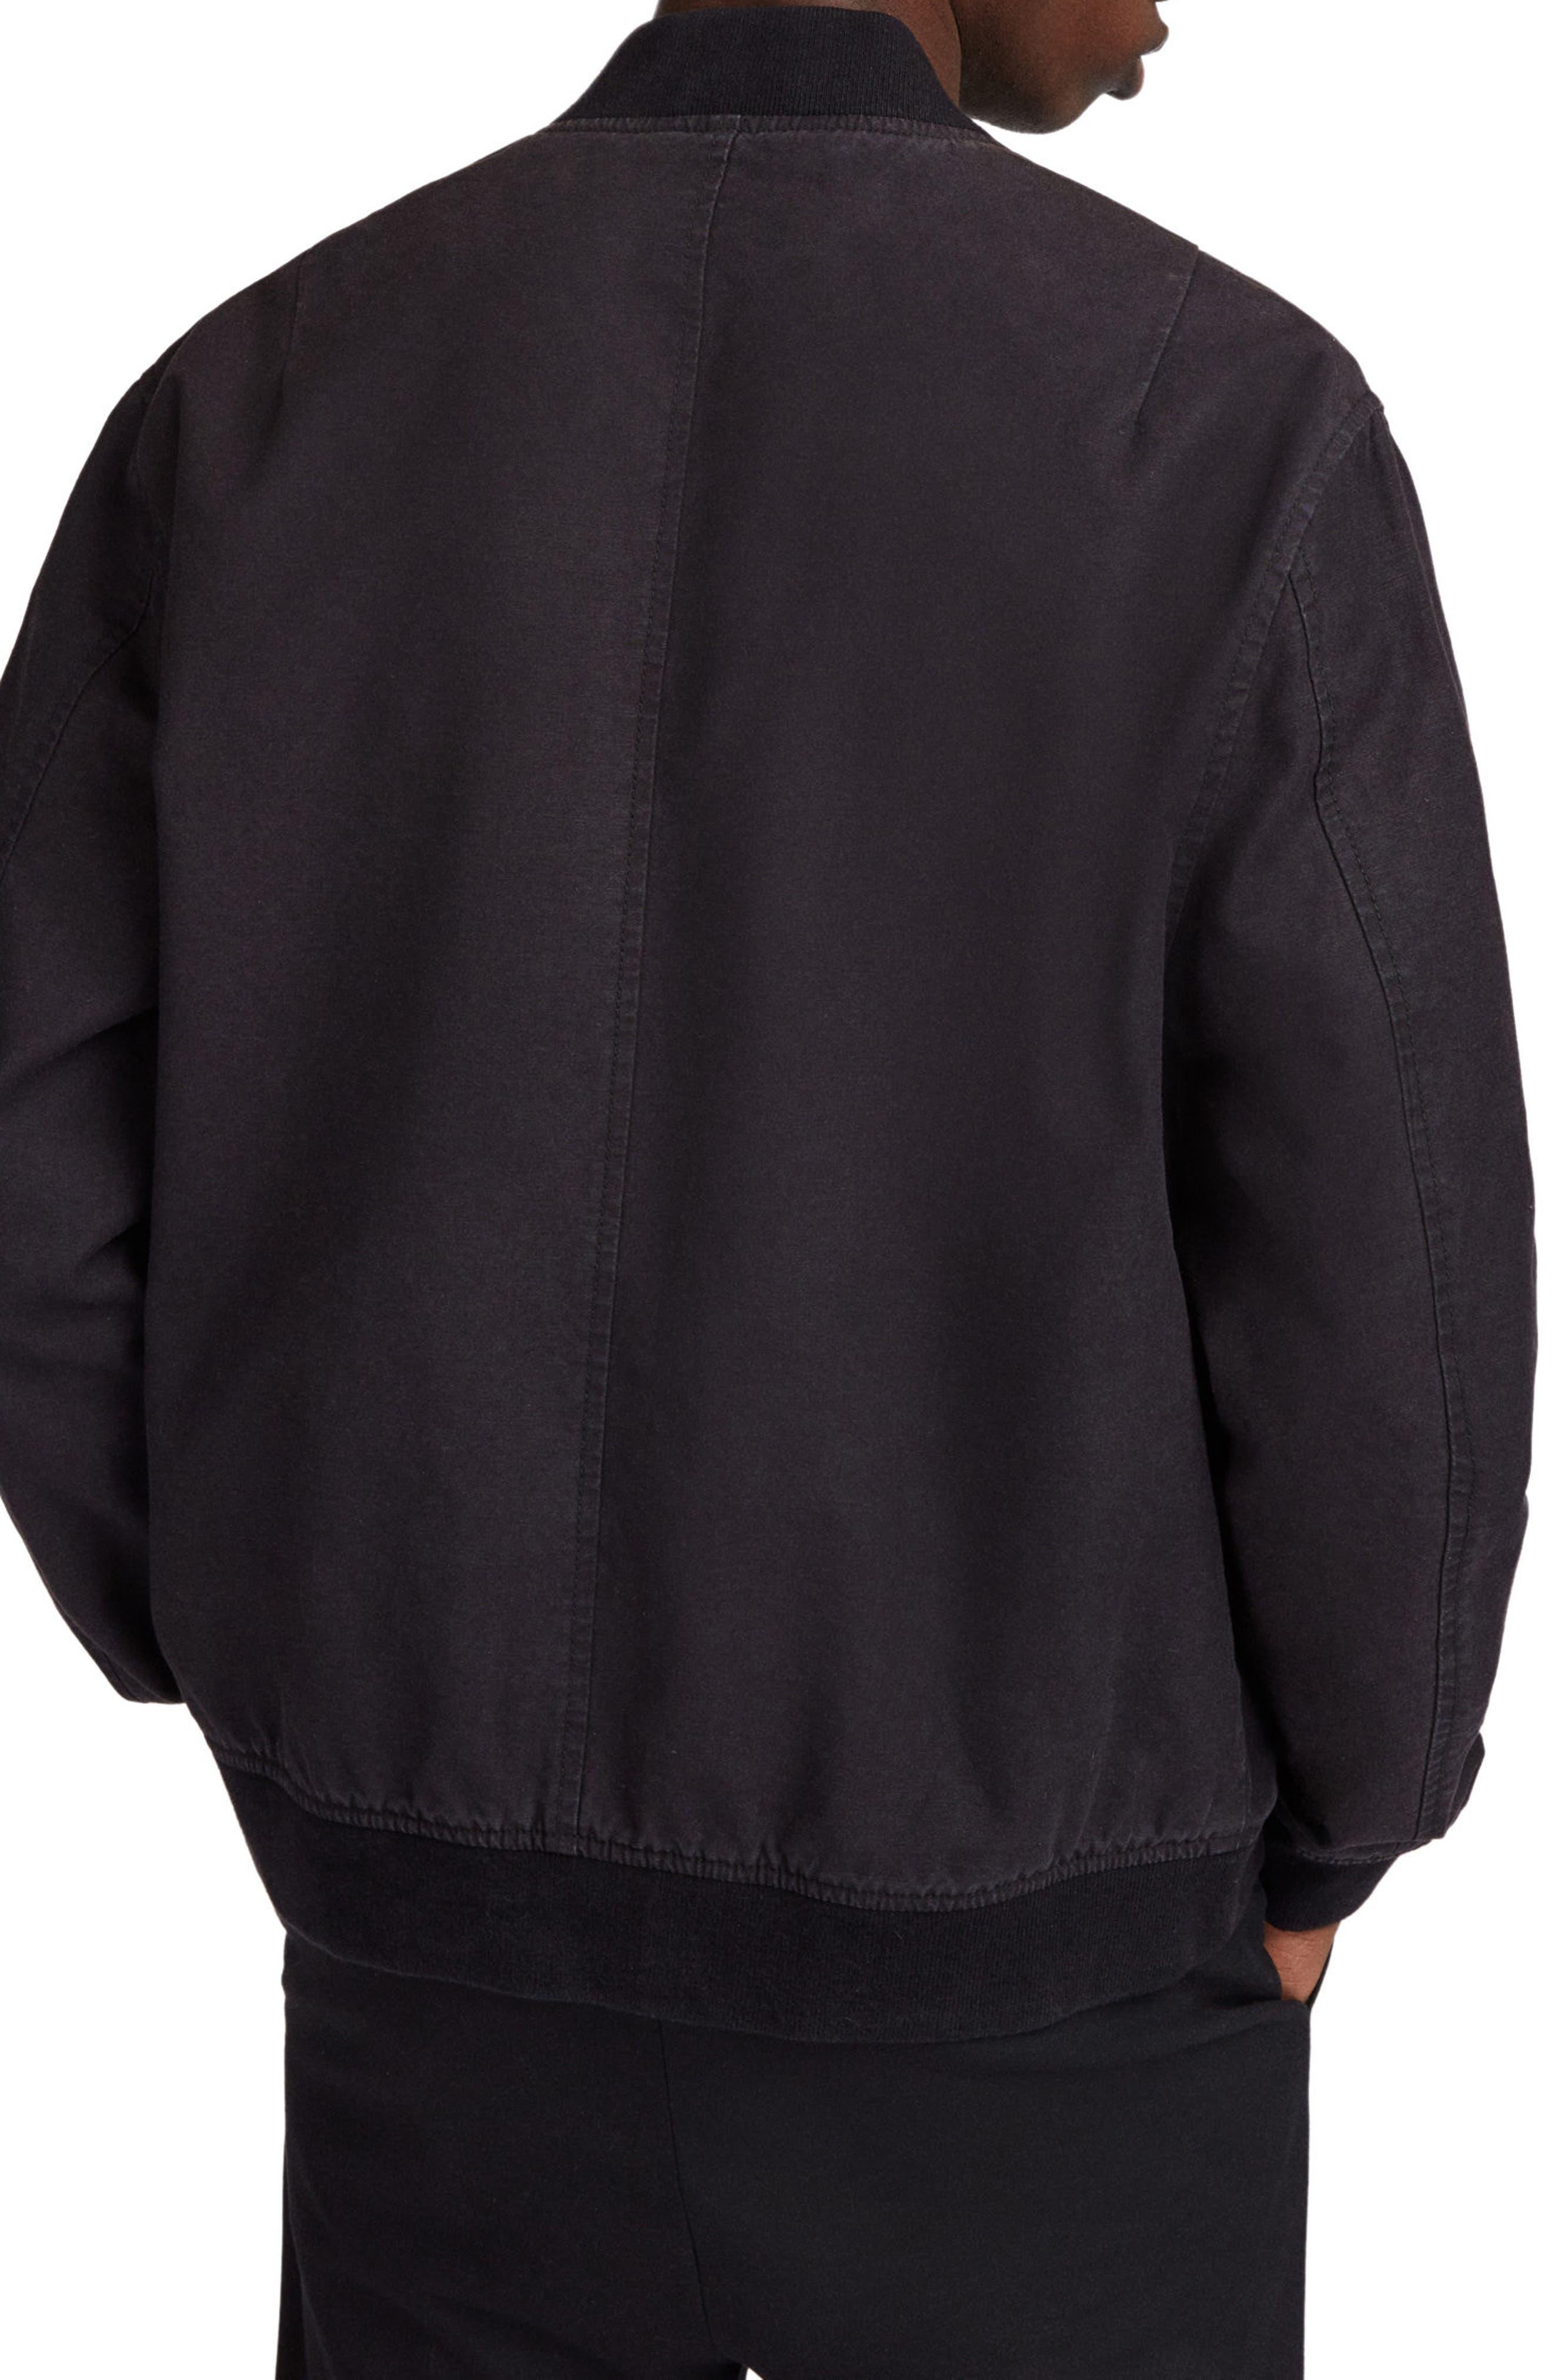 Moyne Bomber Jacket,                             Alternate thumbnail 2, color,                             Black